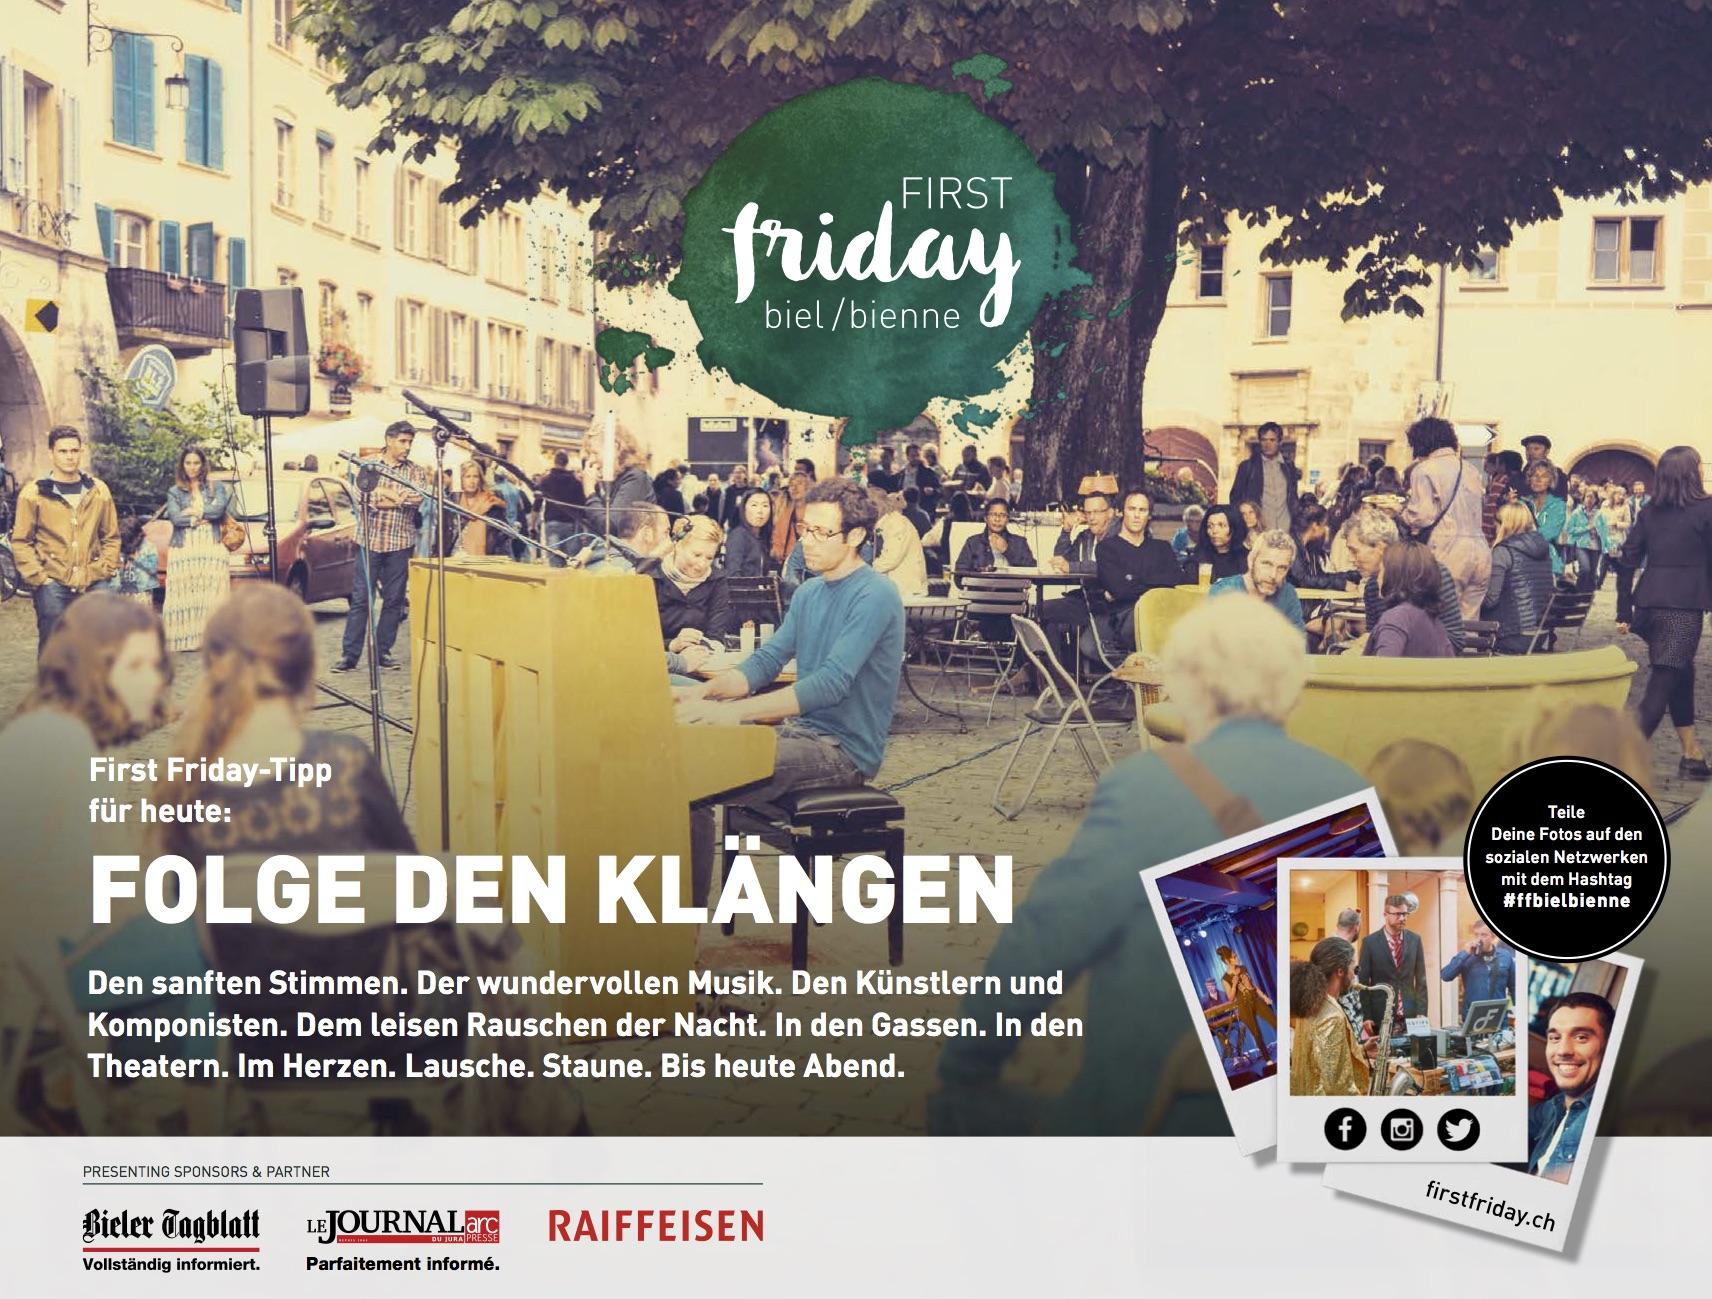 First Friday Biel/Bienne